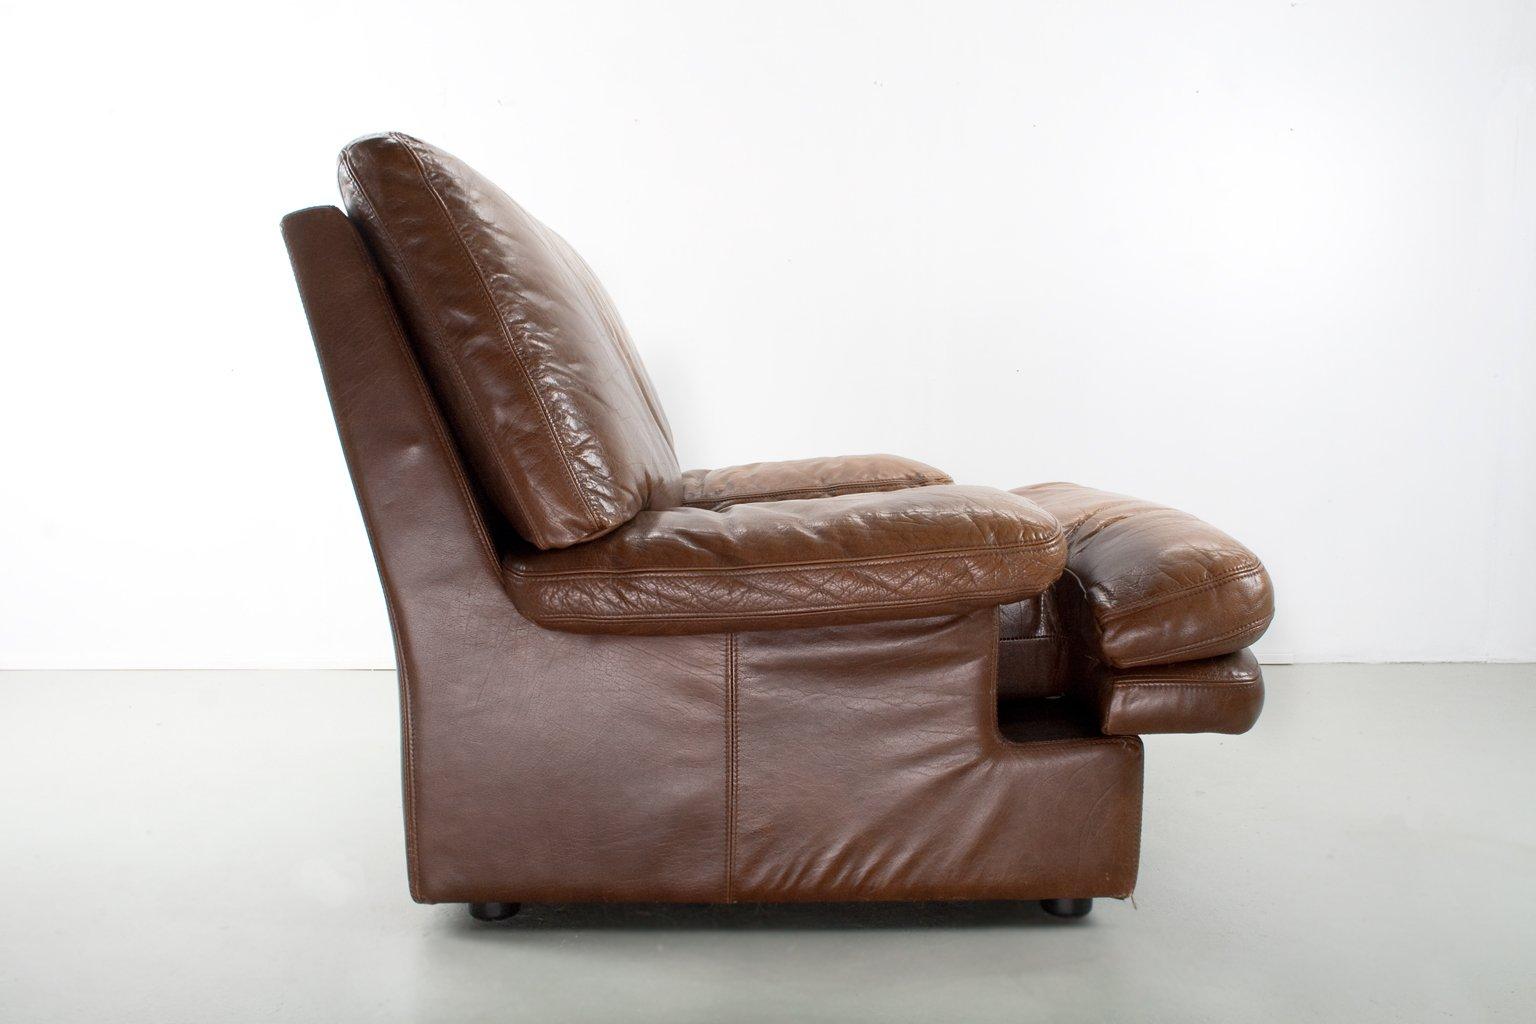 brauner mid century modern ledersessel bei pamono kaufen. Black Bedroom Furniture Sets. Home Design Ideas